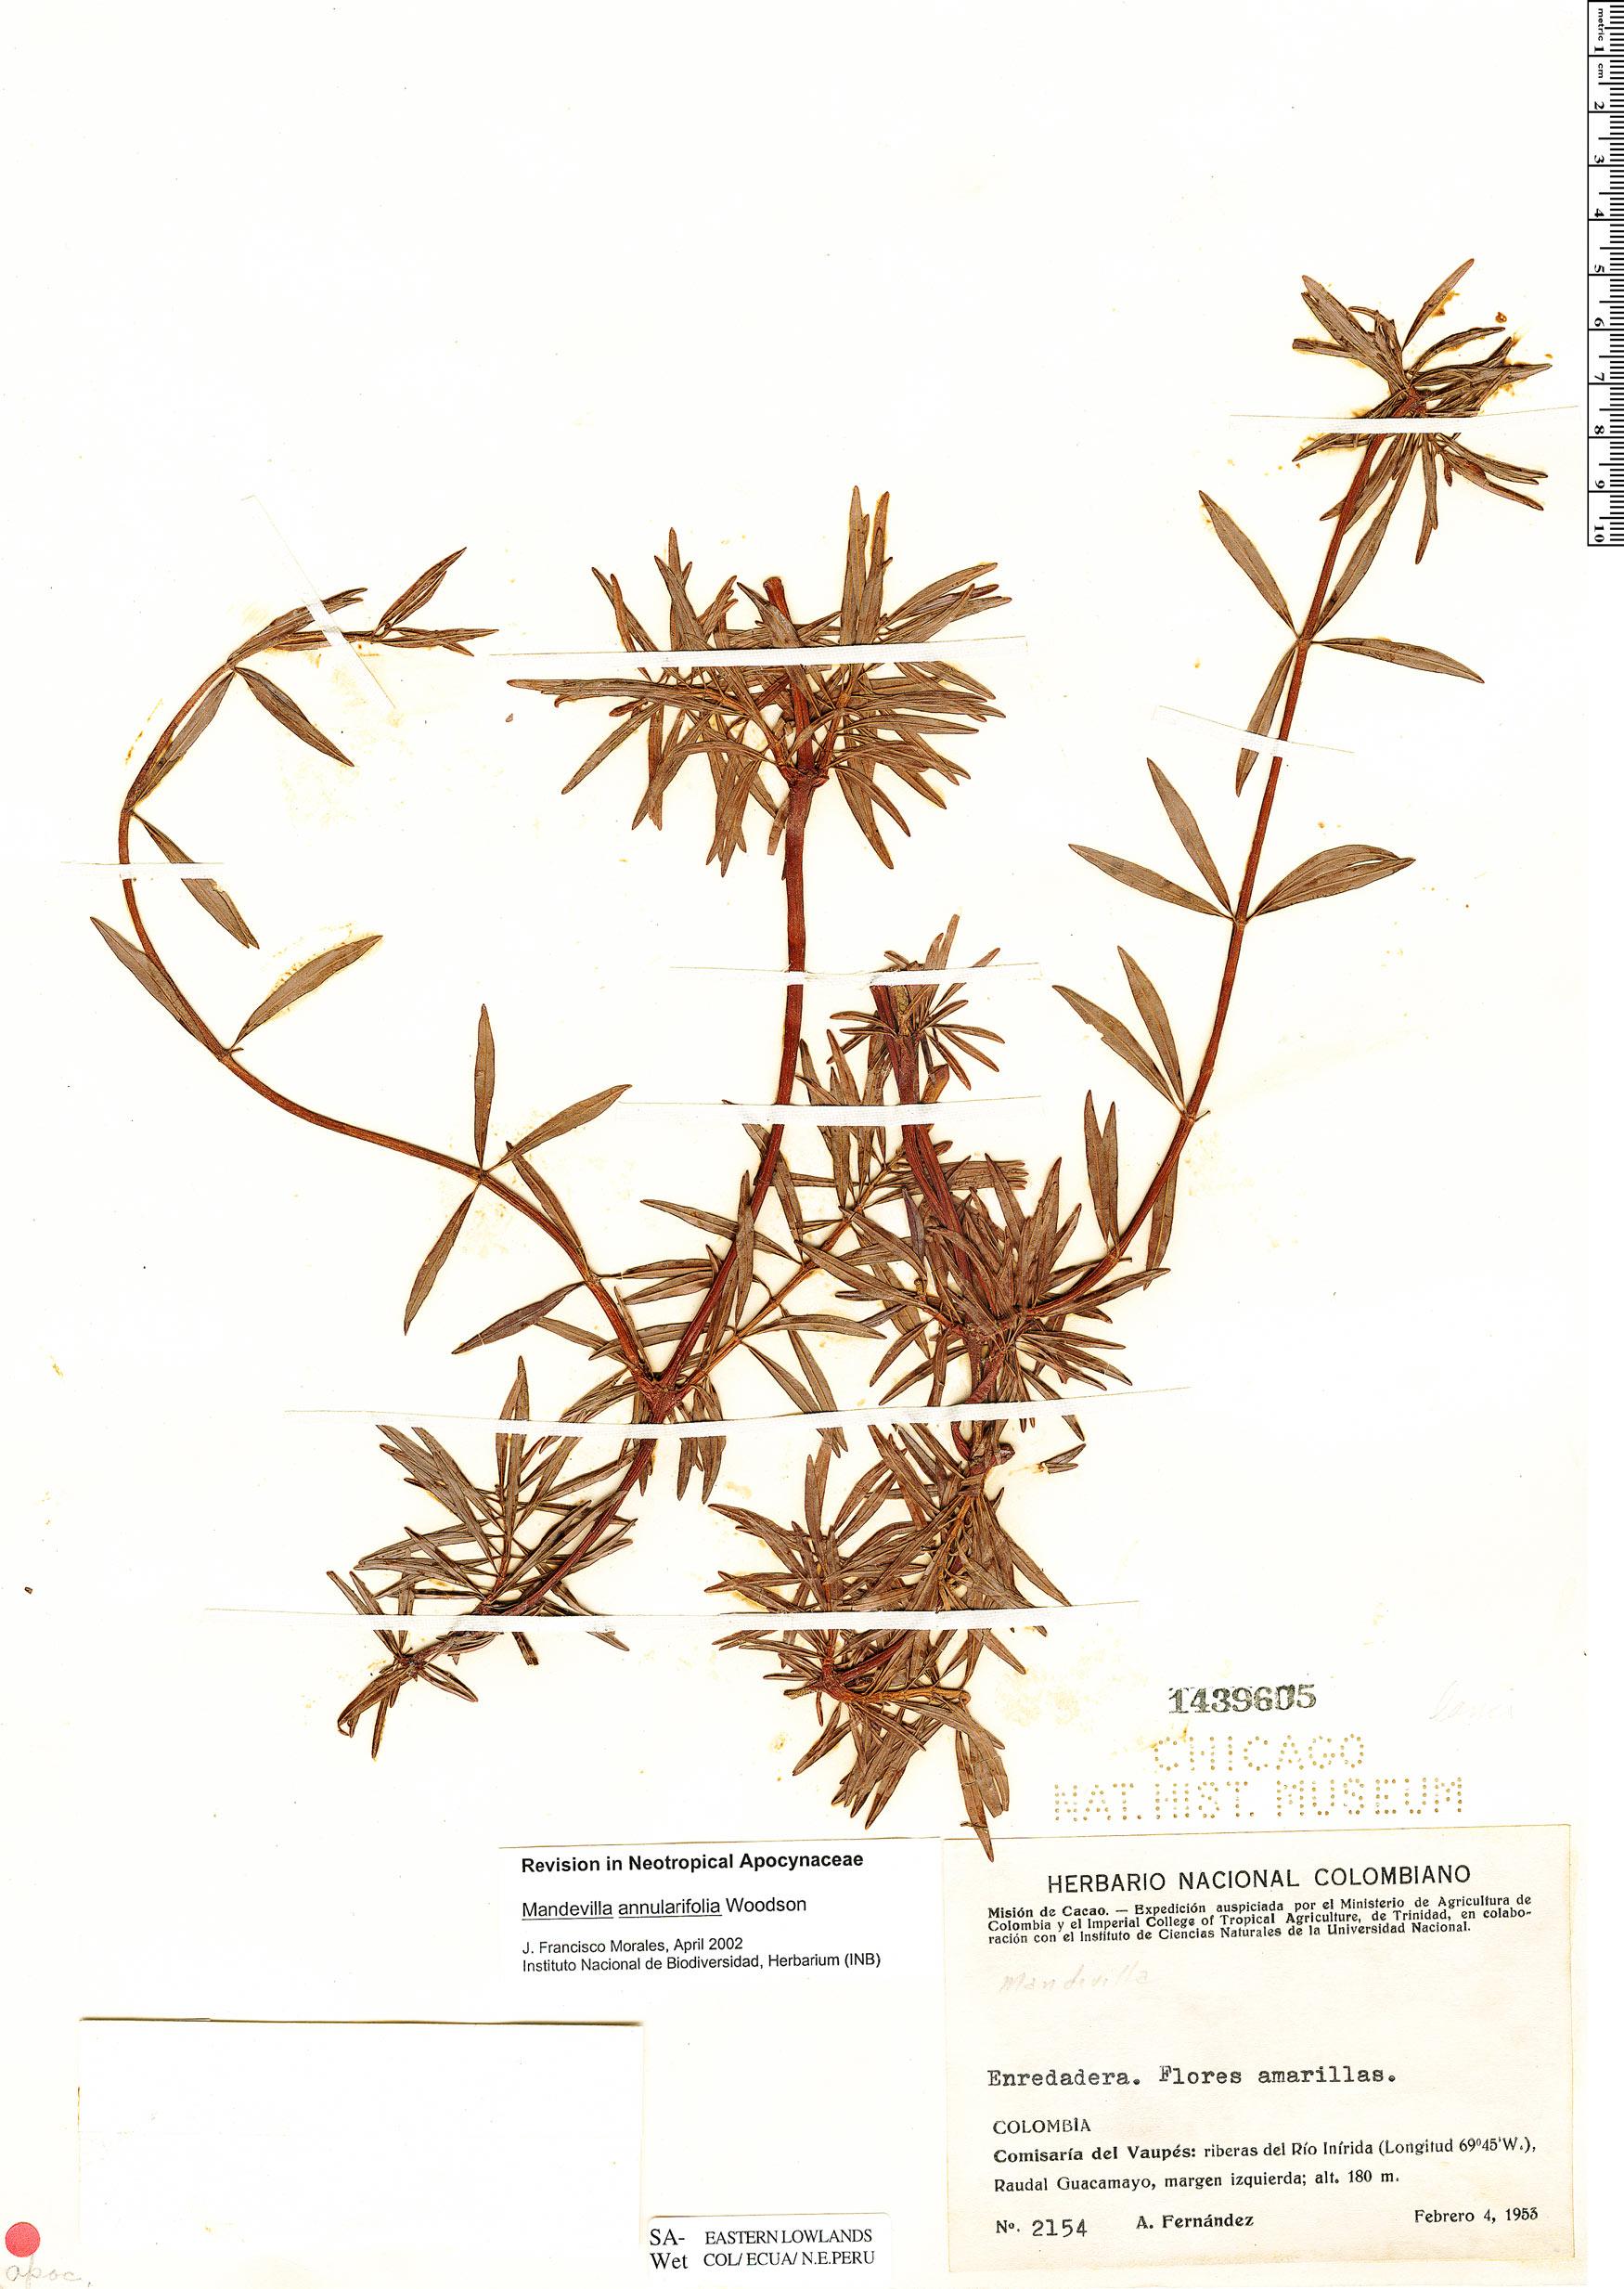 Specimen: Mandevilla annulariifolia